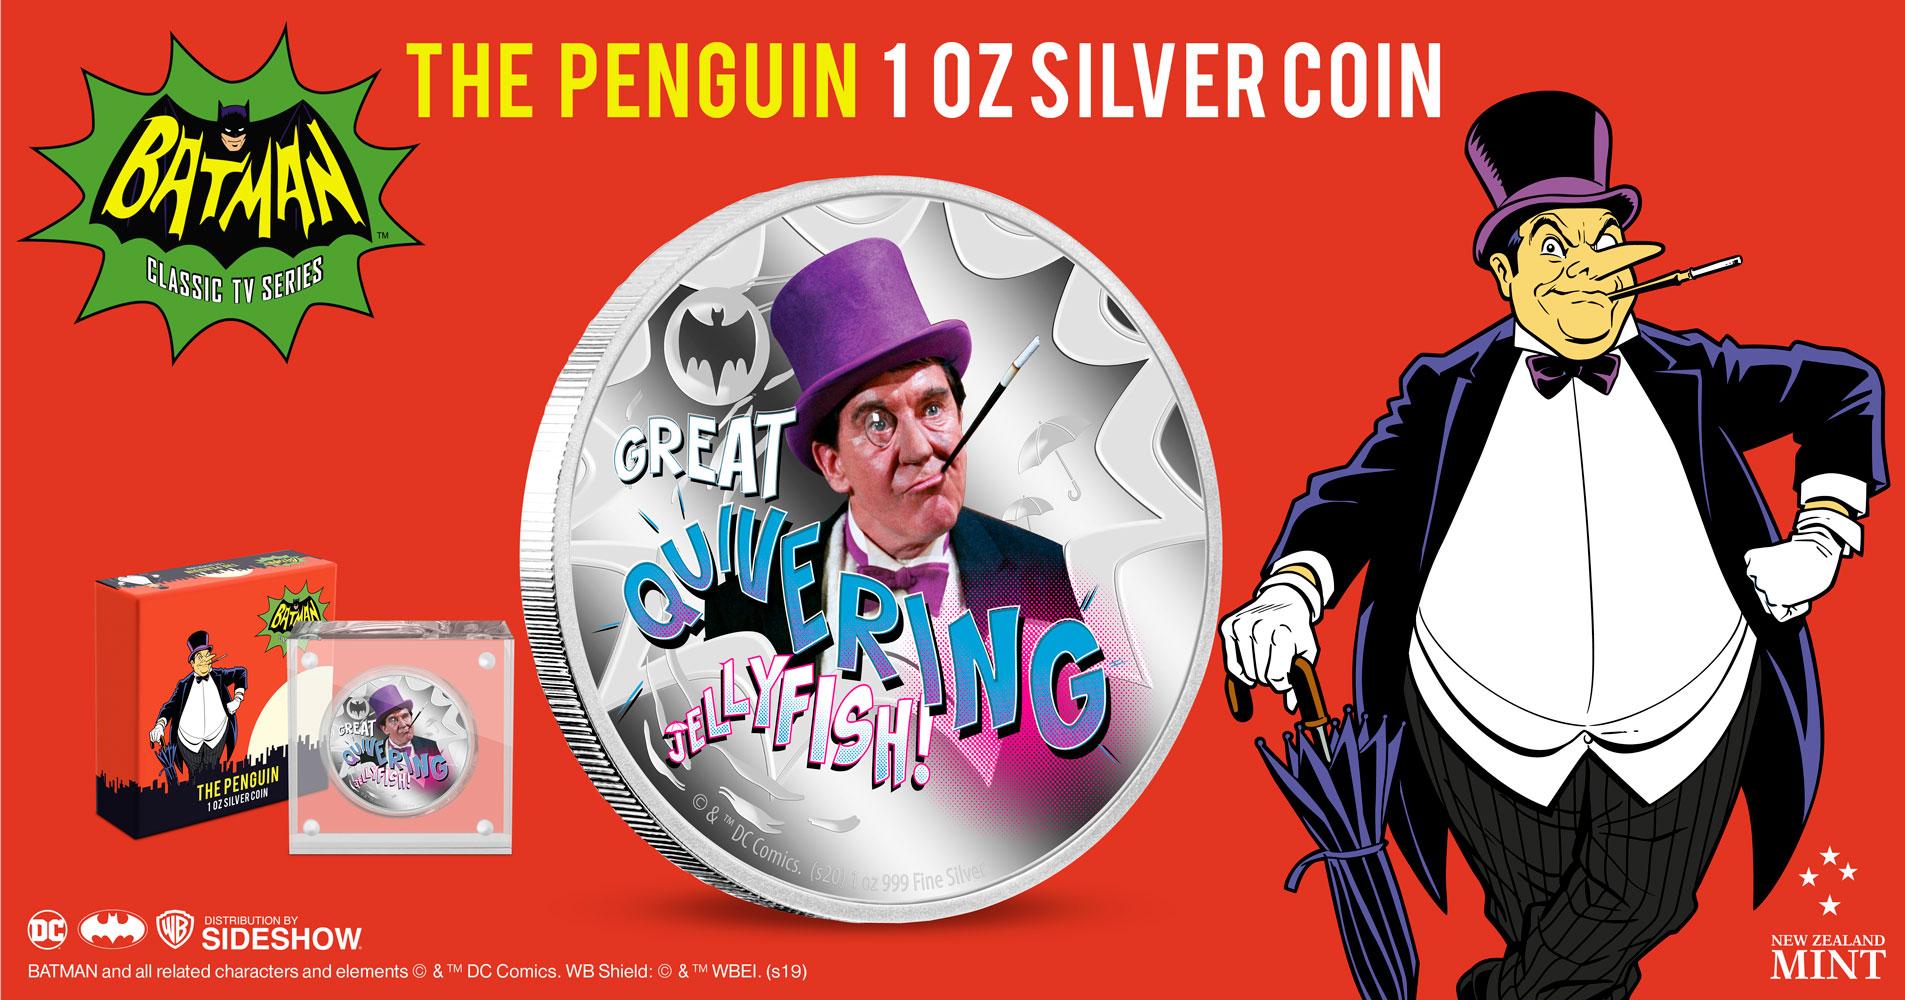 Sideshow Penguin Silver Coin